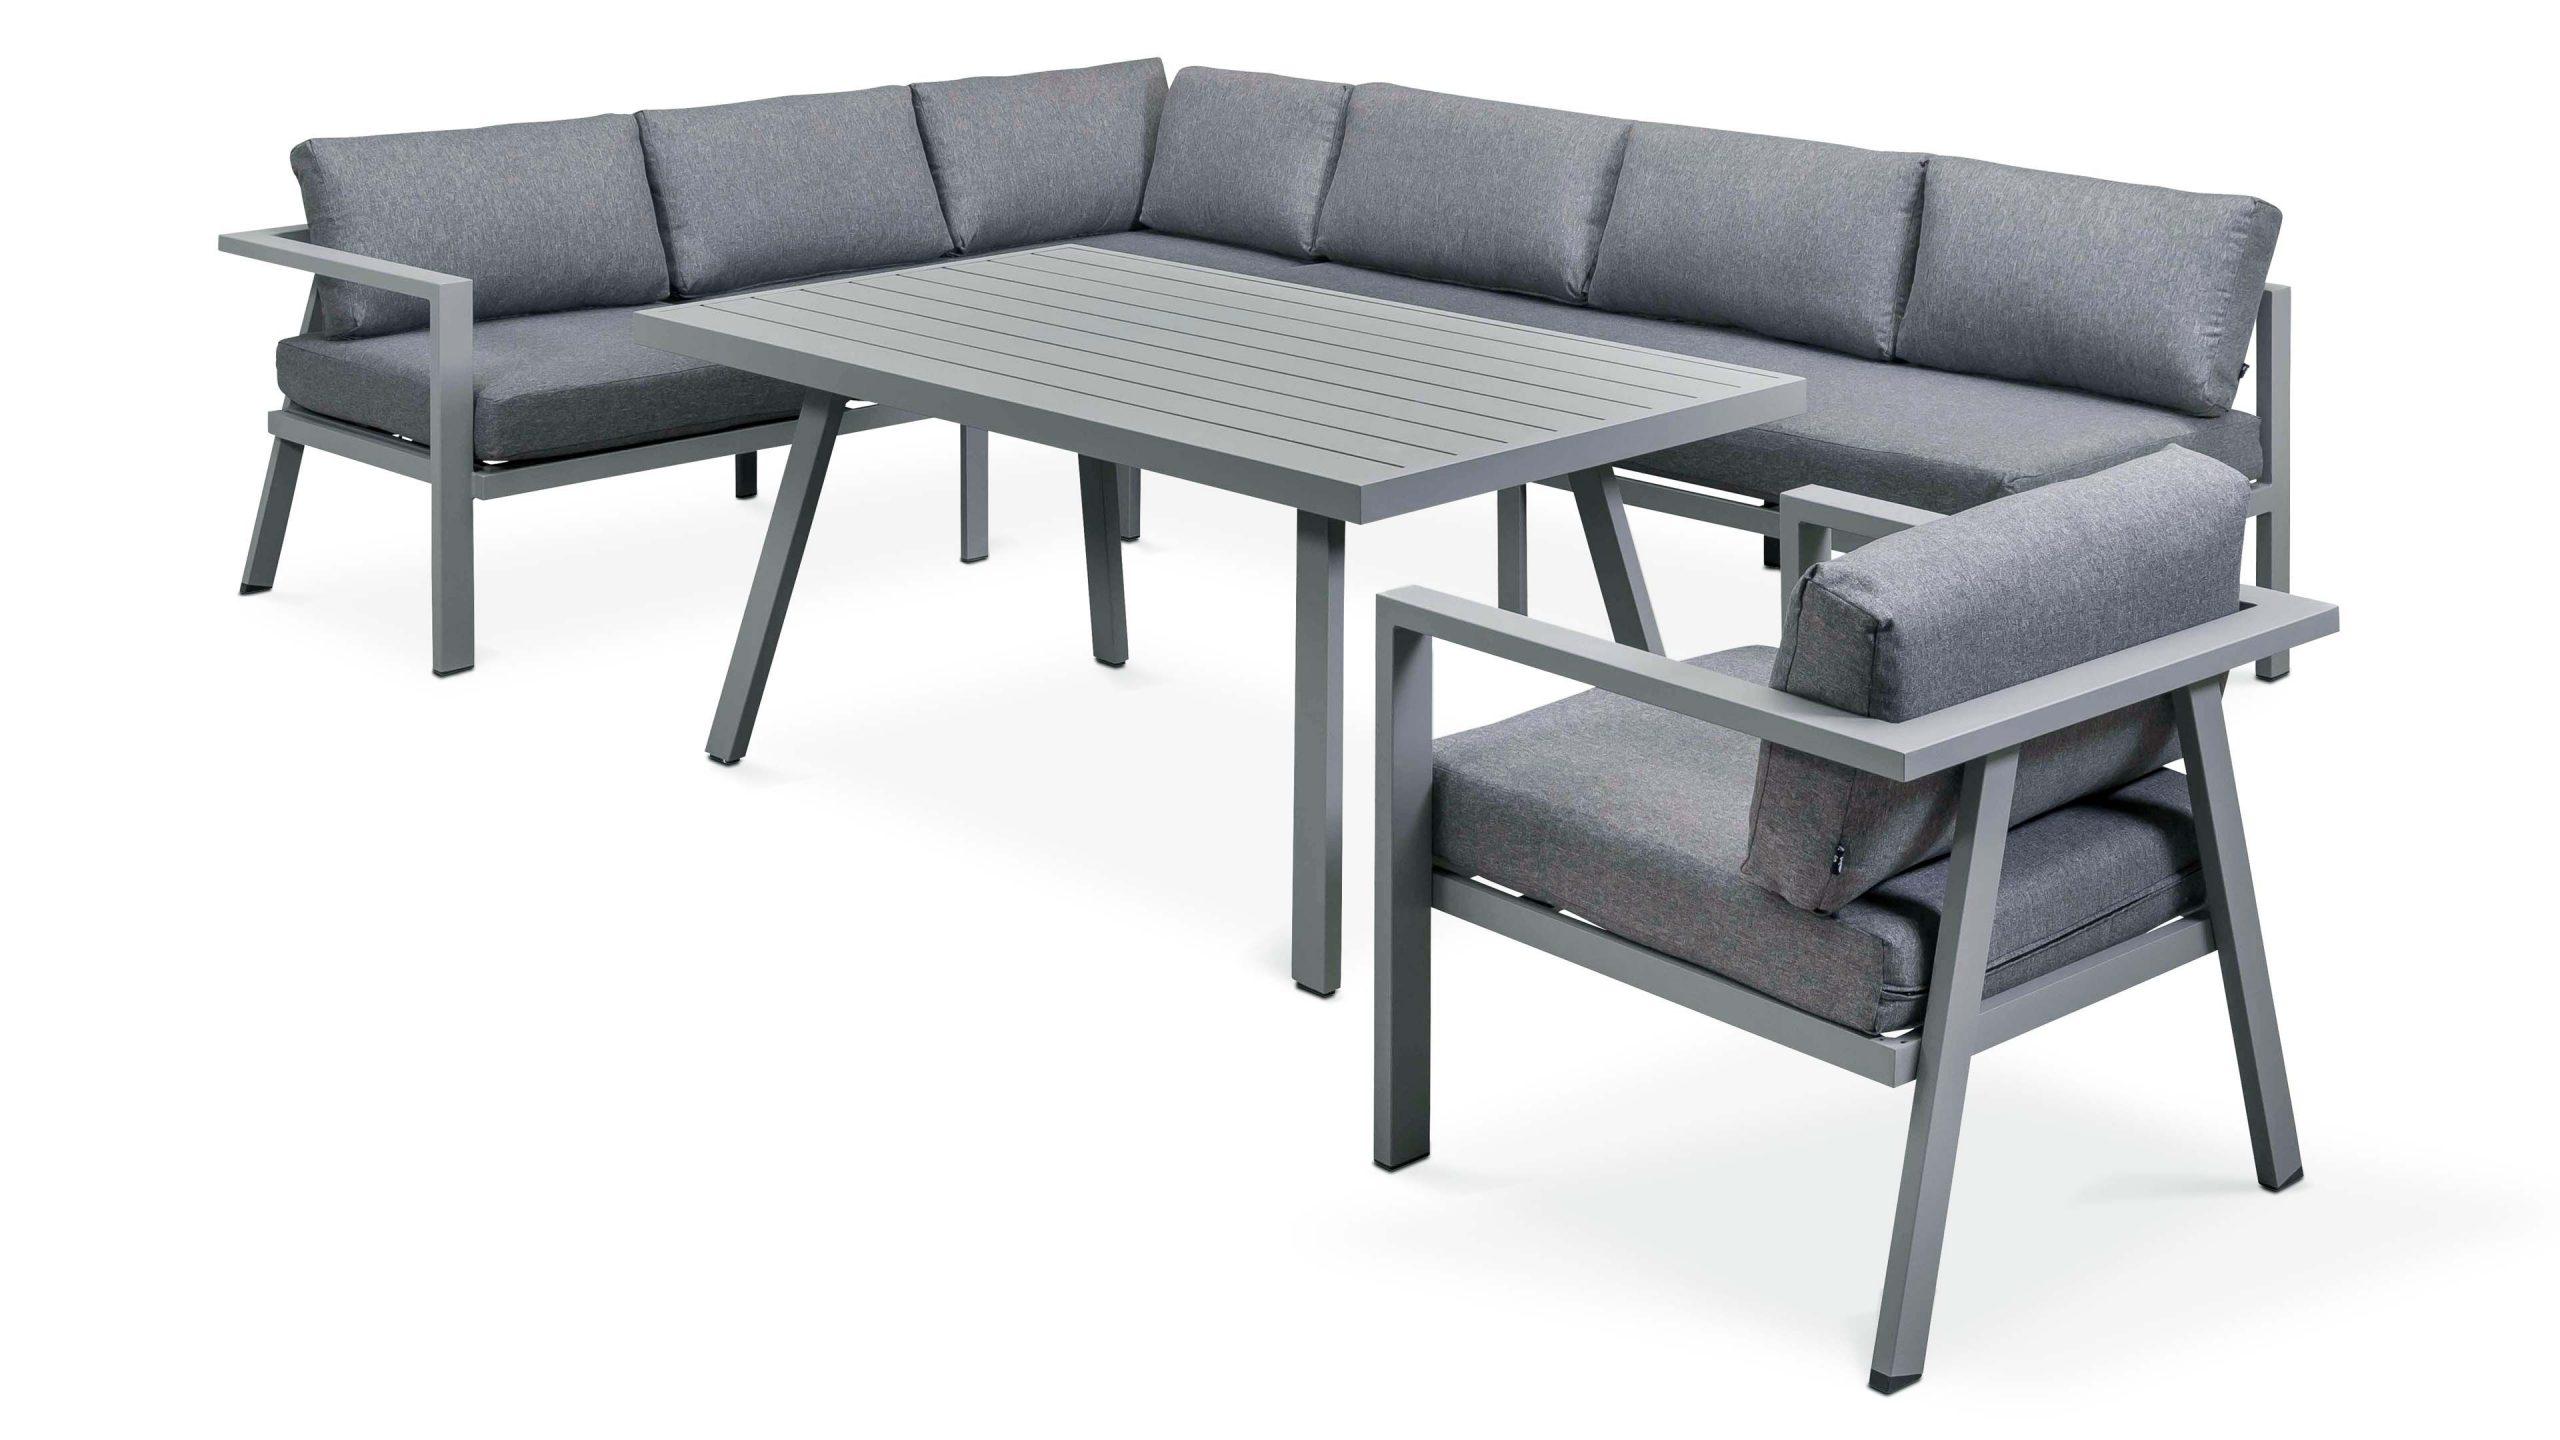 Salon Jardin Table Fauteuil Canapé D'angle intérieur Table De Jardin Aluminium Et Composite